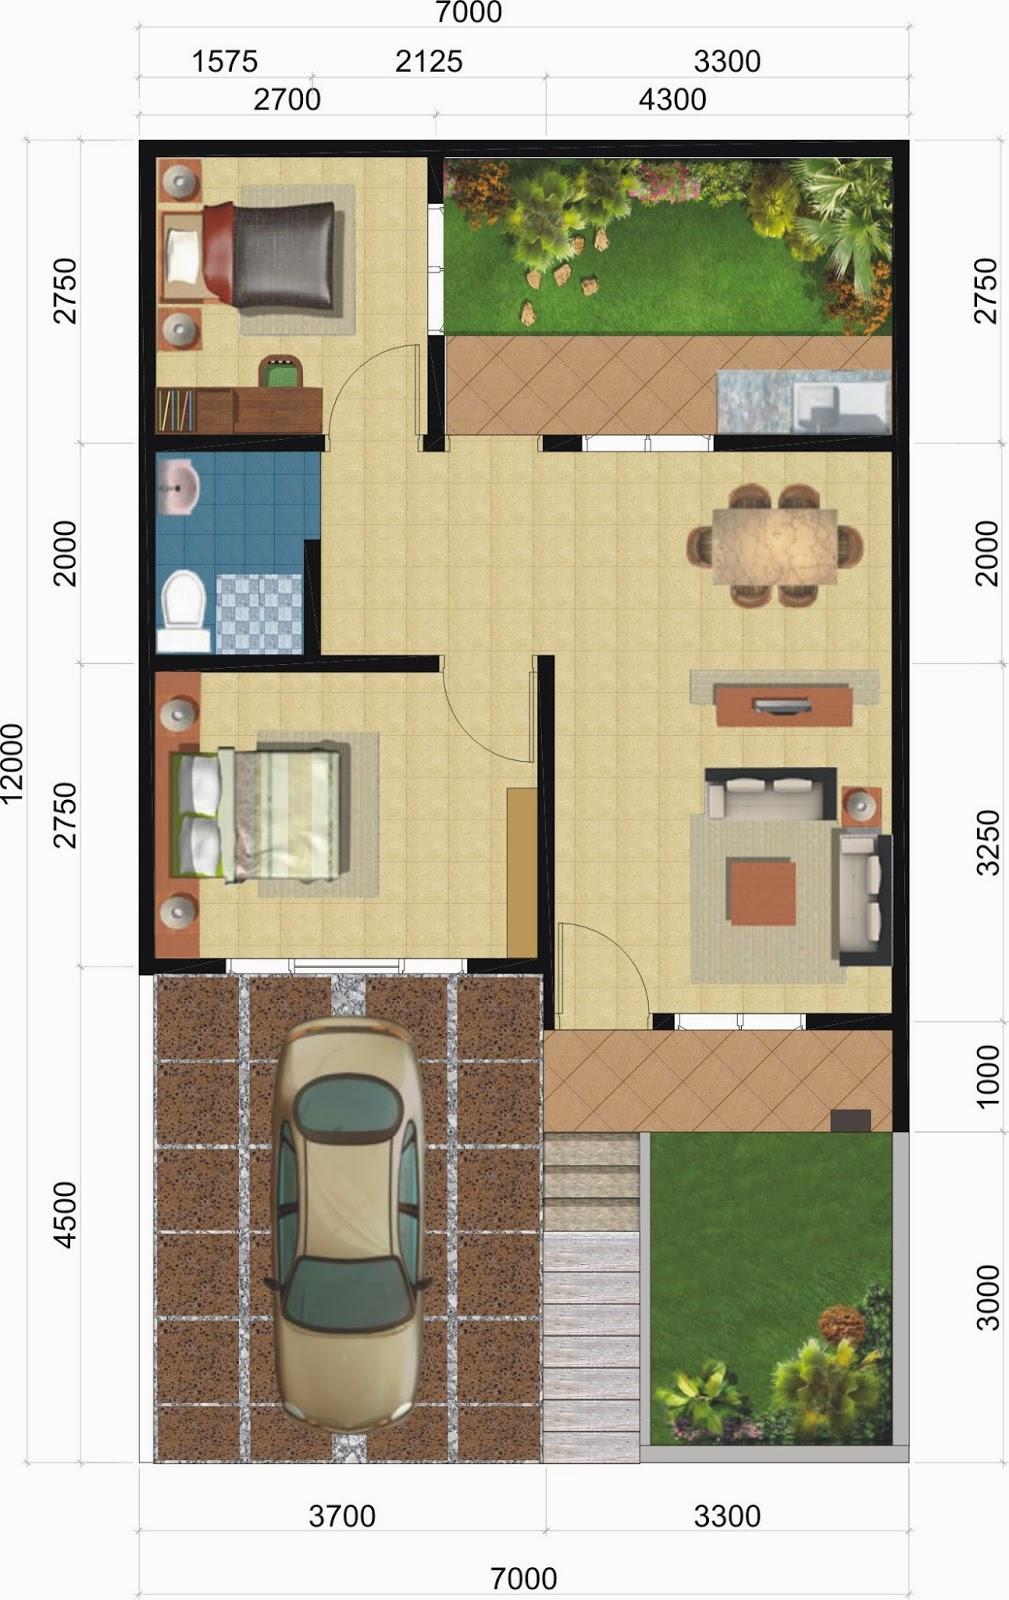 Kumpulan Desain Rumah Minimalis Ukuran 5x10 Kumpulan Desain Rumah